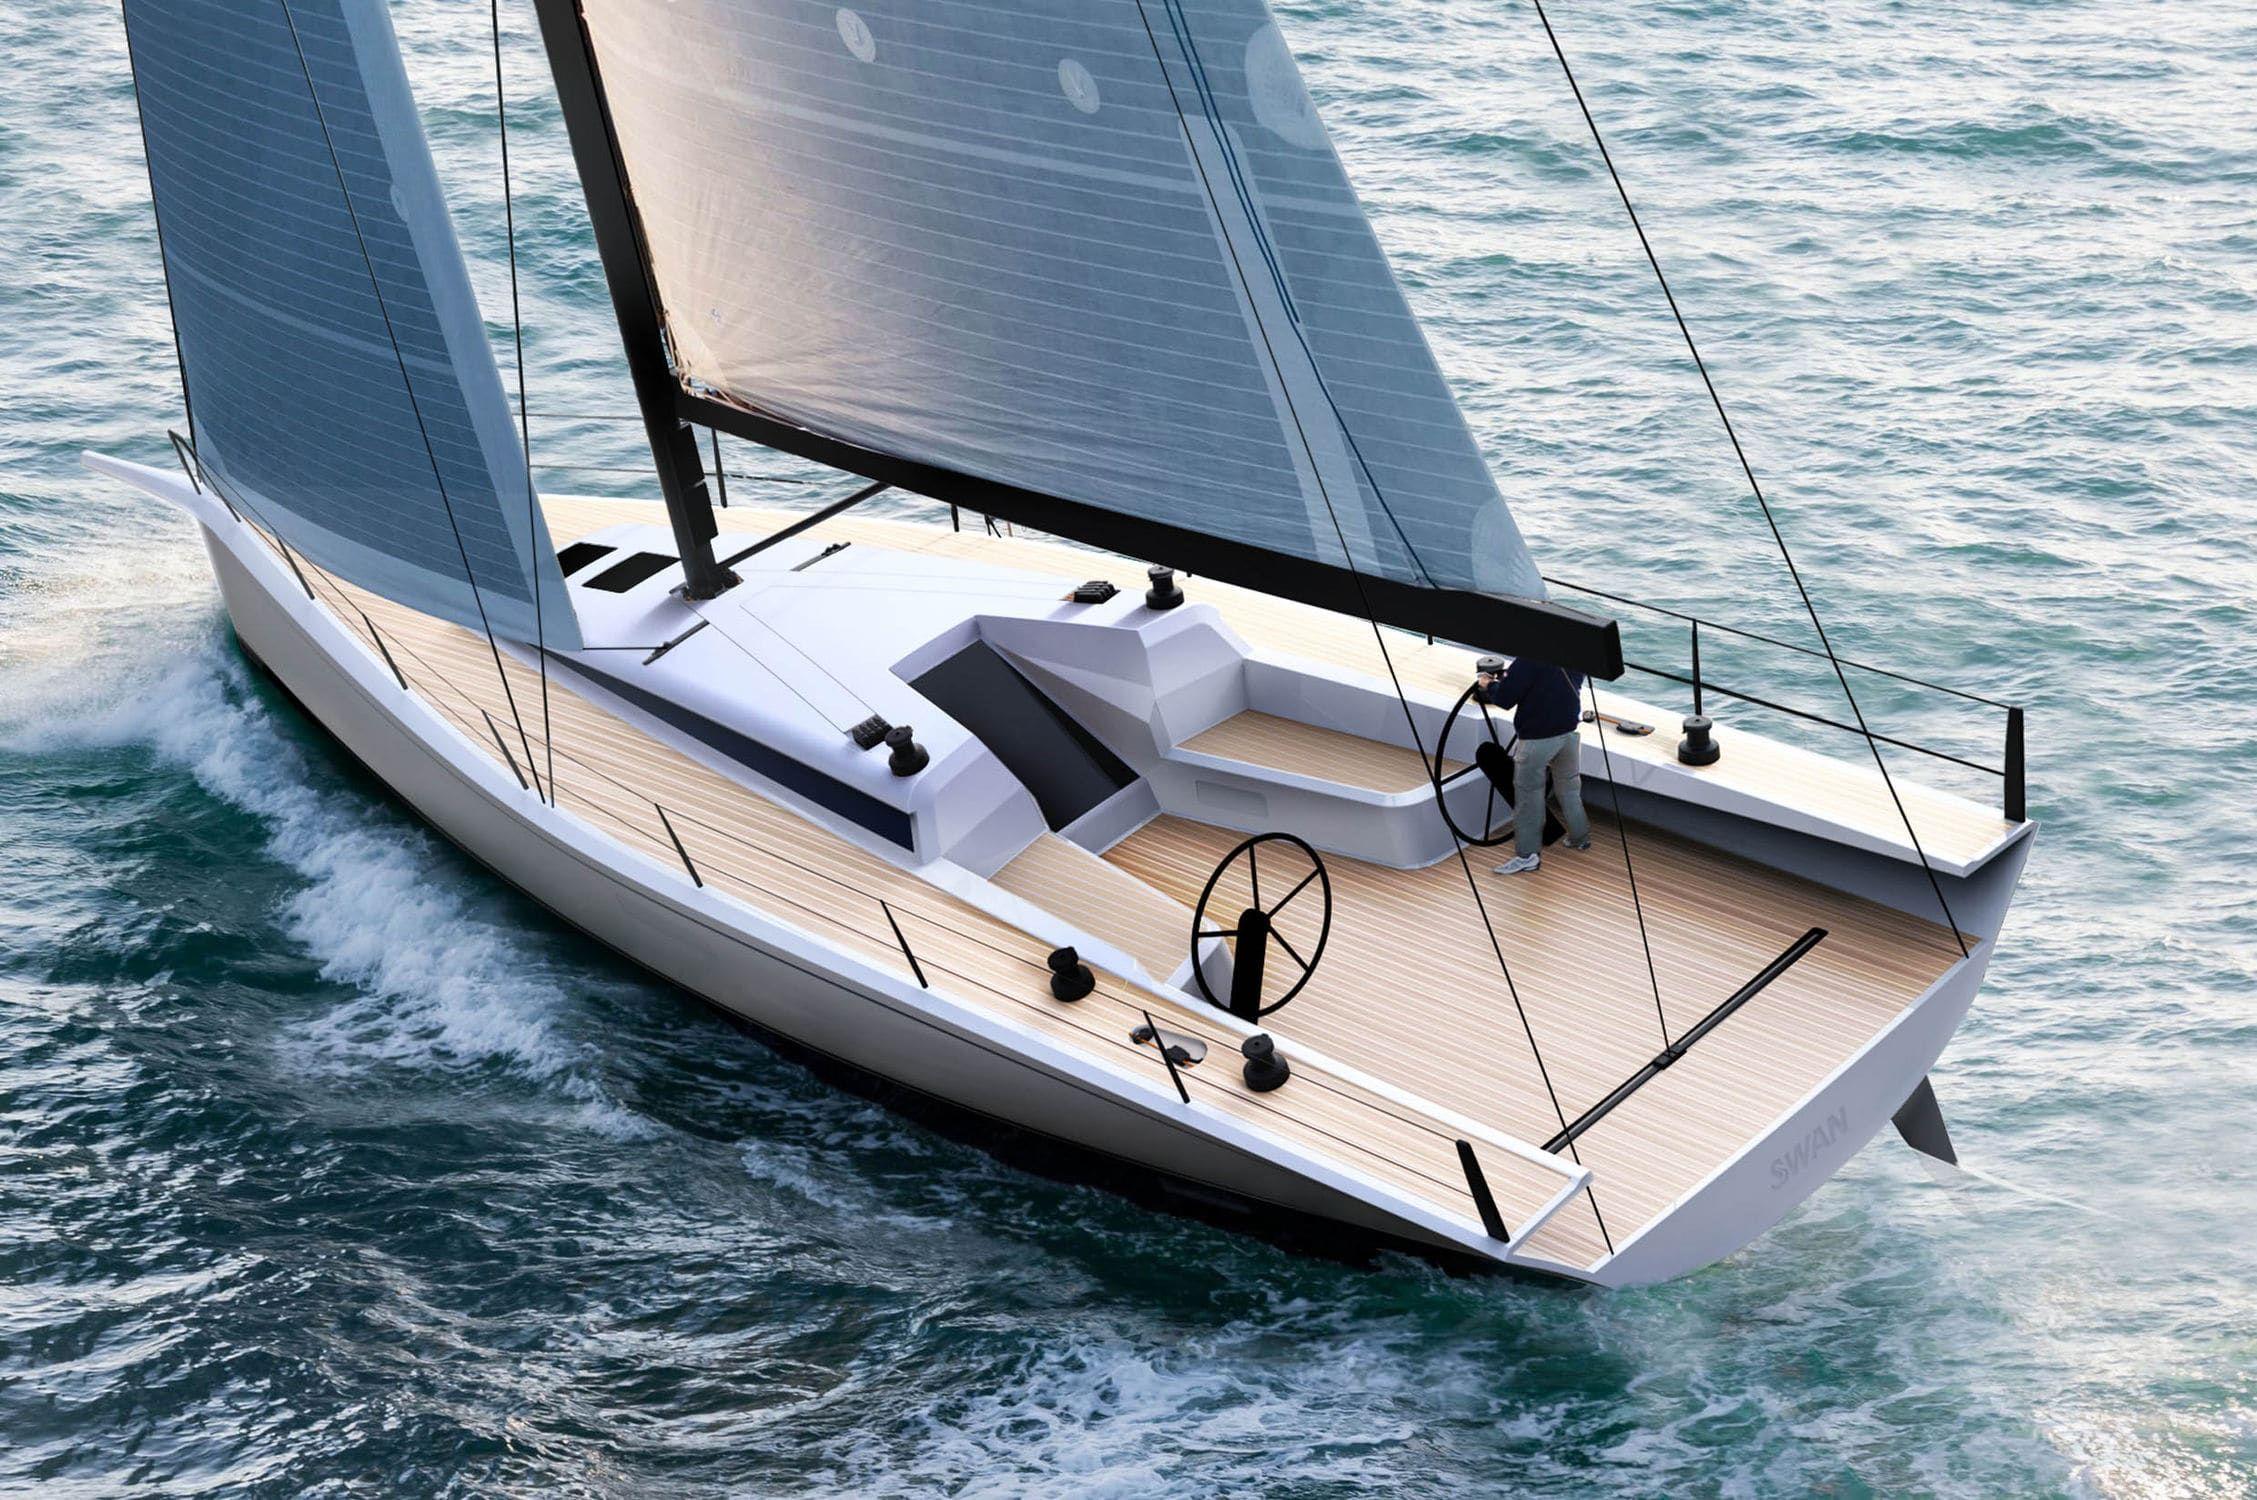 Vinyl Teak Boat Flooring No Cracking Synthetic Teak Yacht